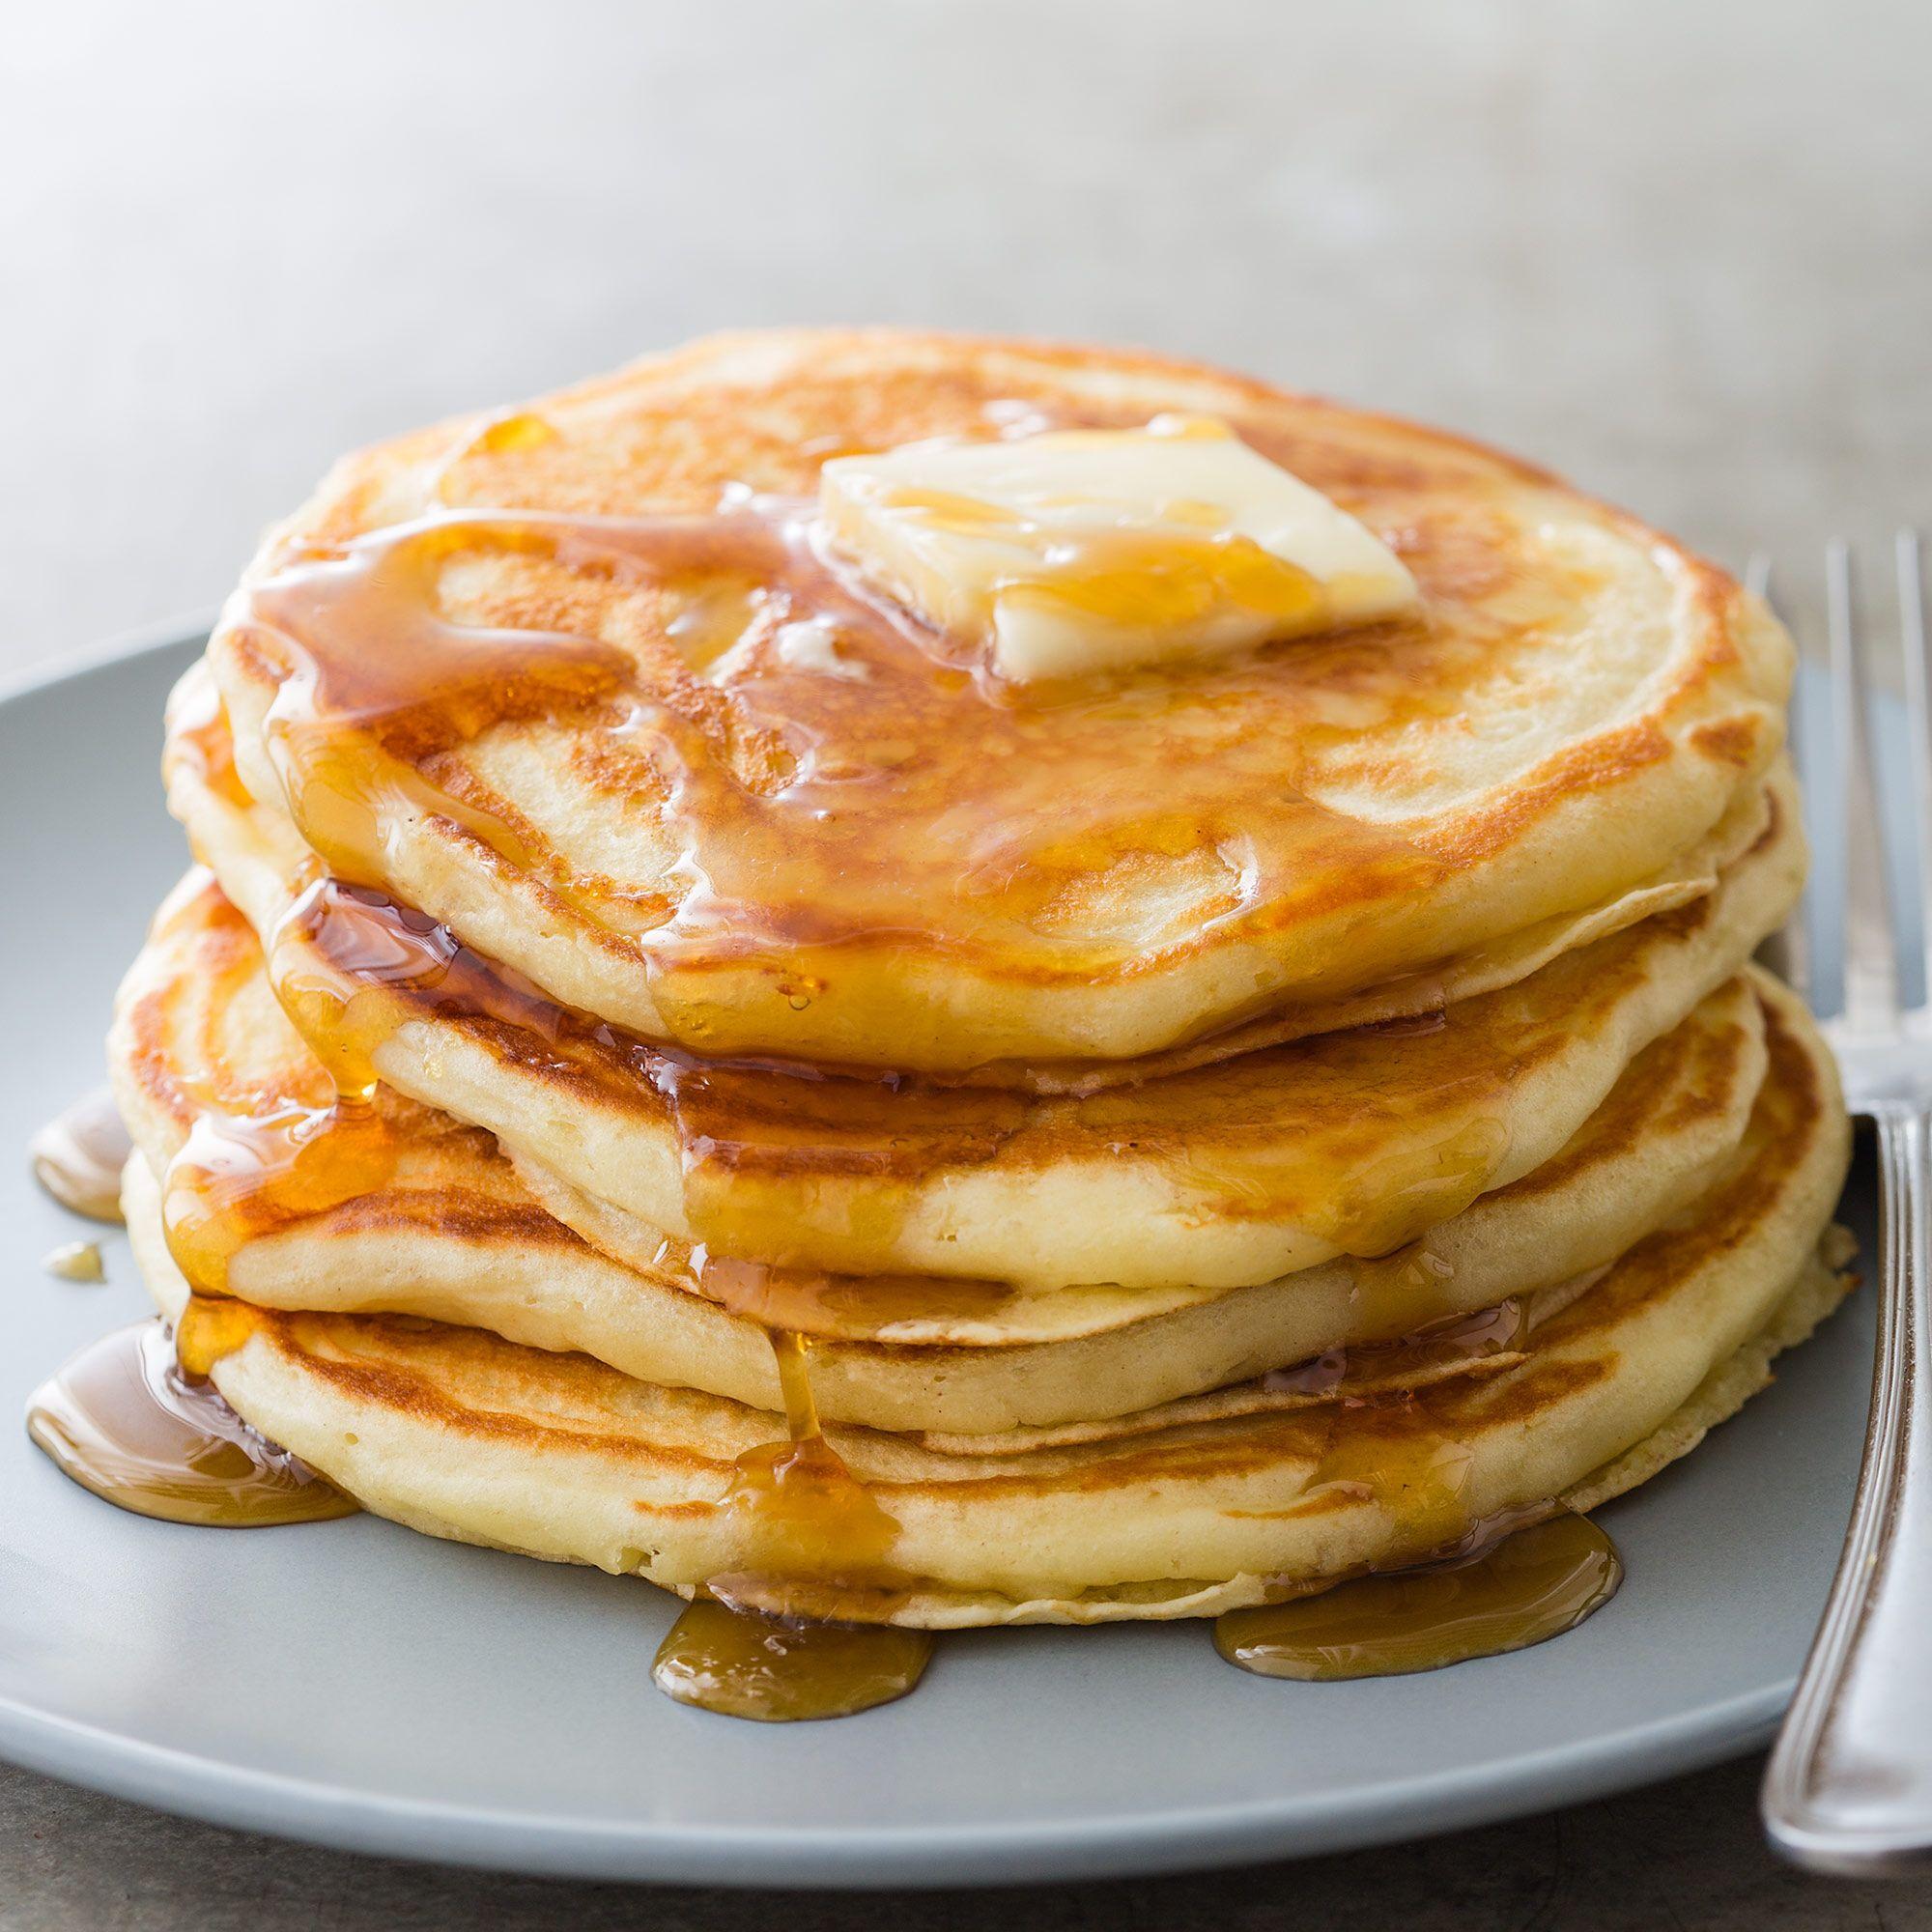 Pancake Recipe 400g Sr Flour 50g Sugar 2 5 Teaspoon Baking Powder Pinch Salt 2 X Eggs Pancake Recipe Buttermilk Cooks Illustrated Recipes Buttermilk Pancakes